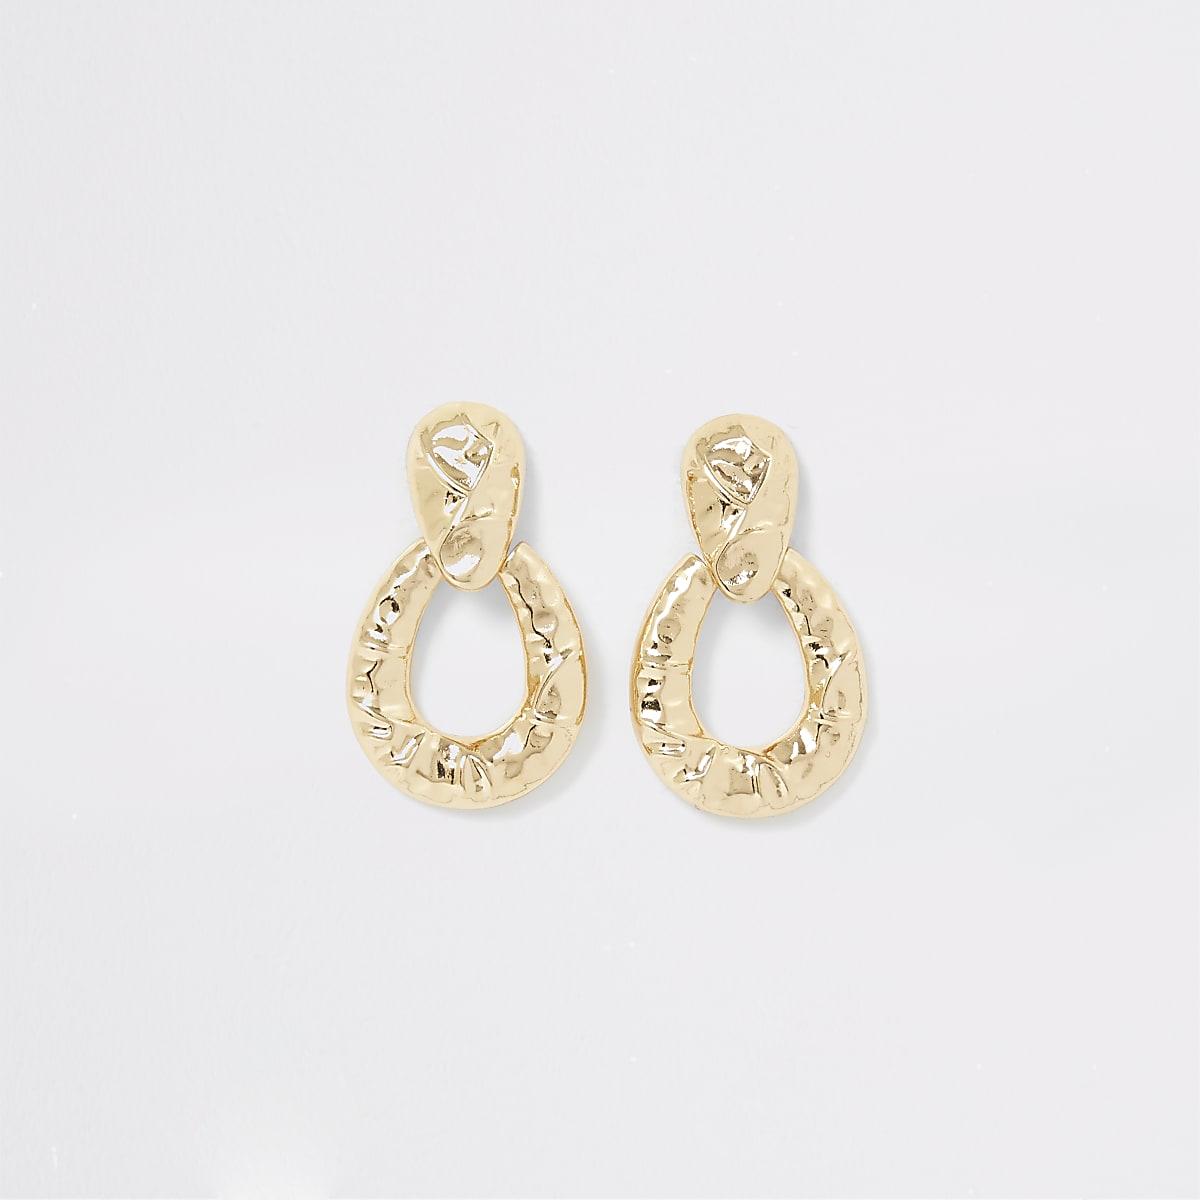 Gold color battered door knocker earrings